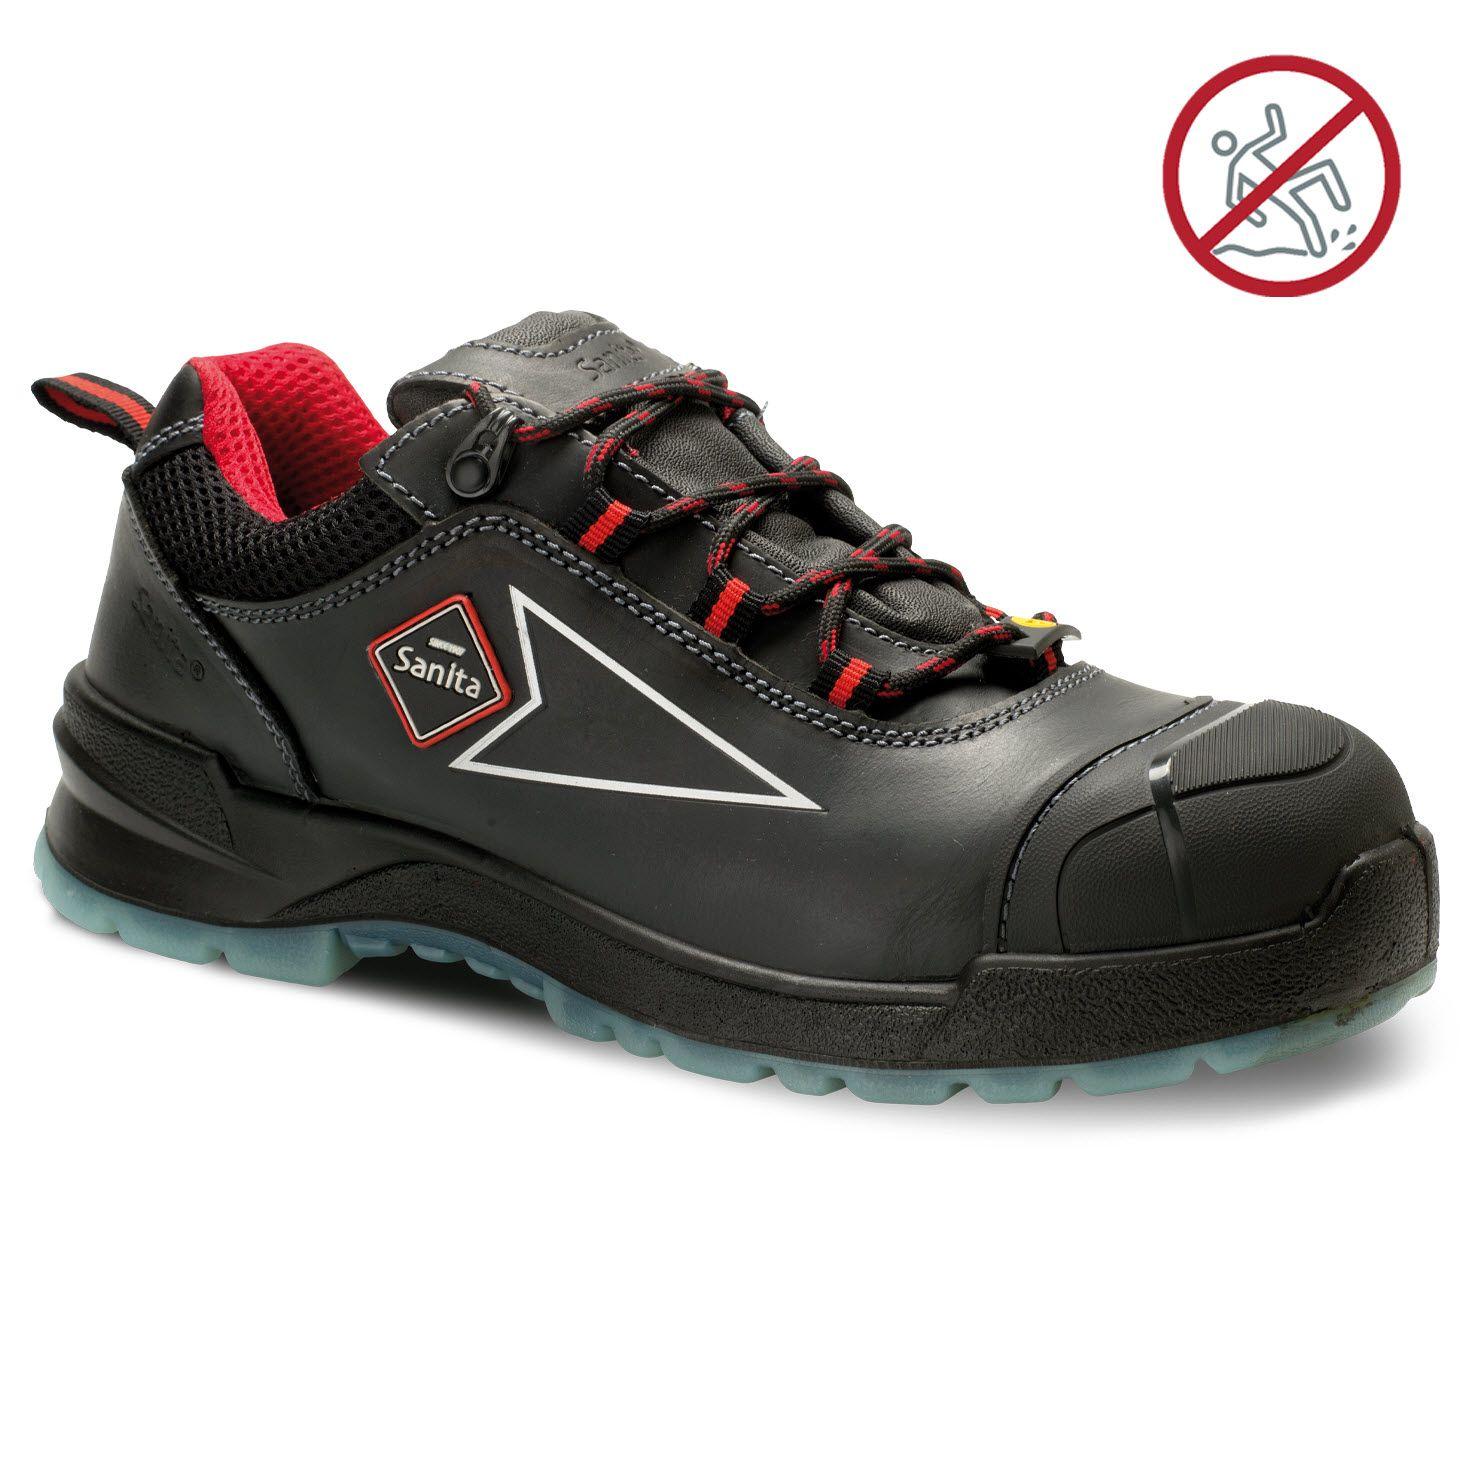 ANTRAZITE Unisex Safety Boot-Sanita